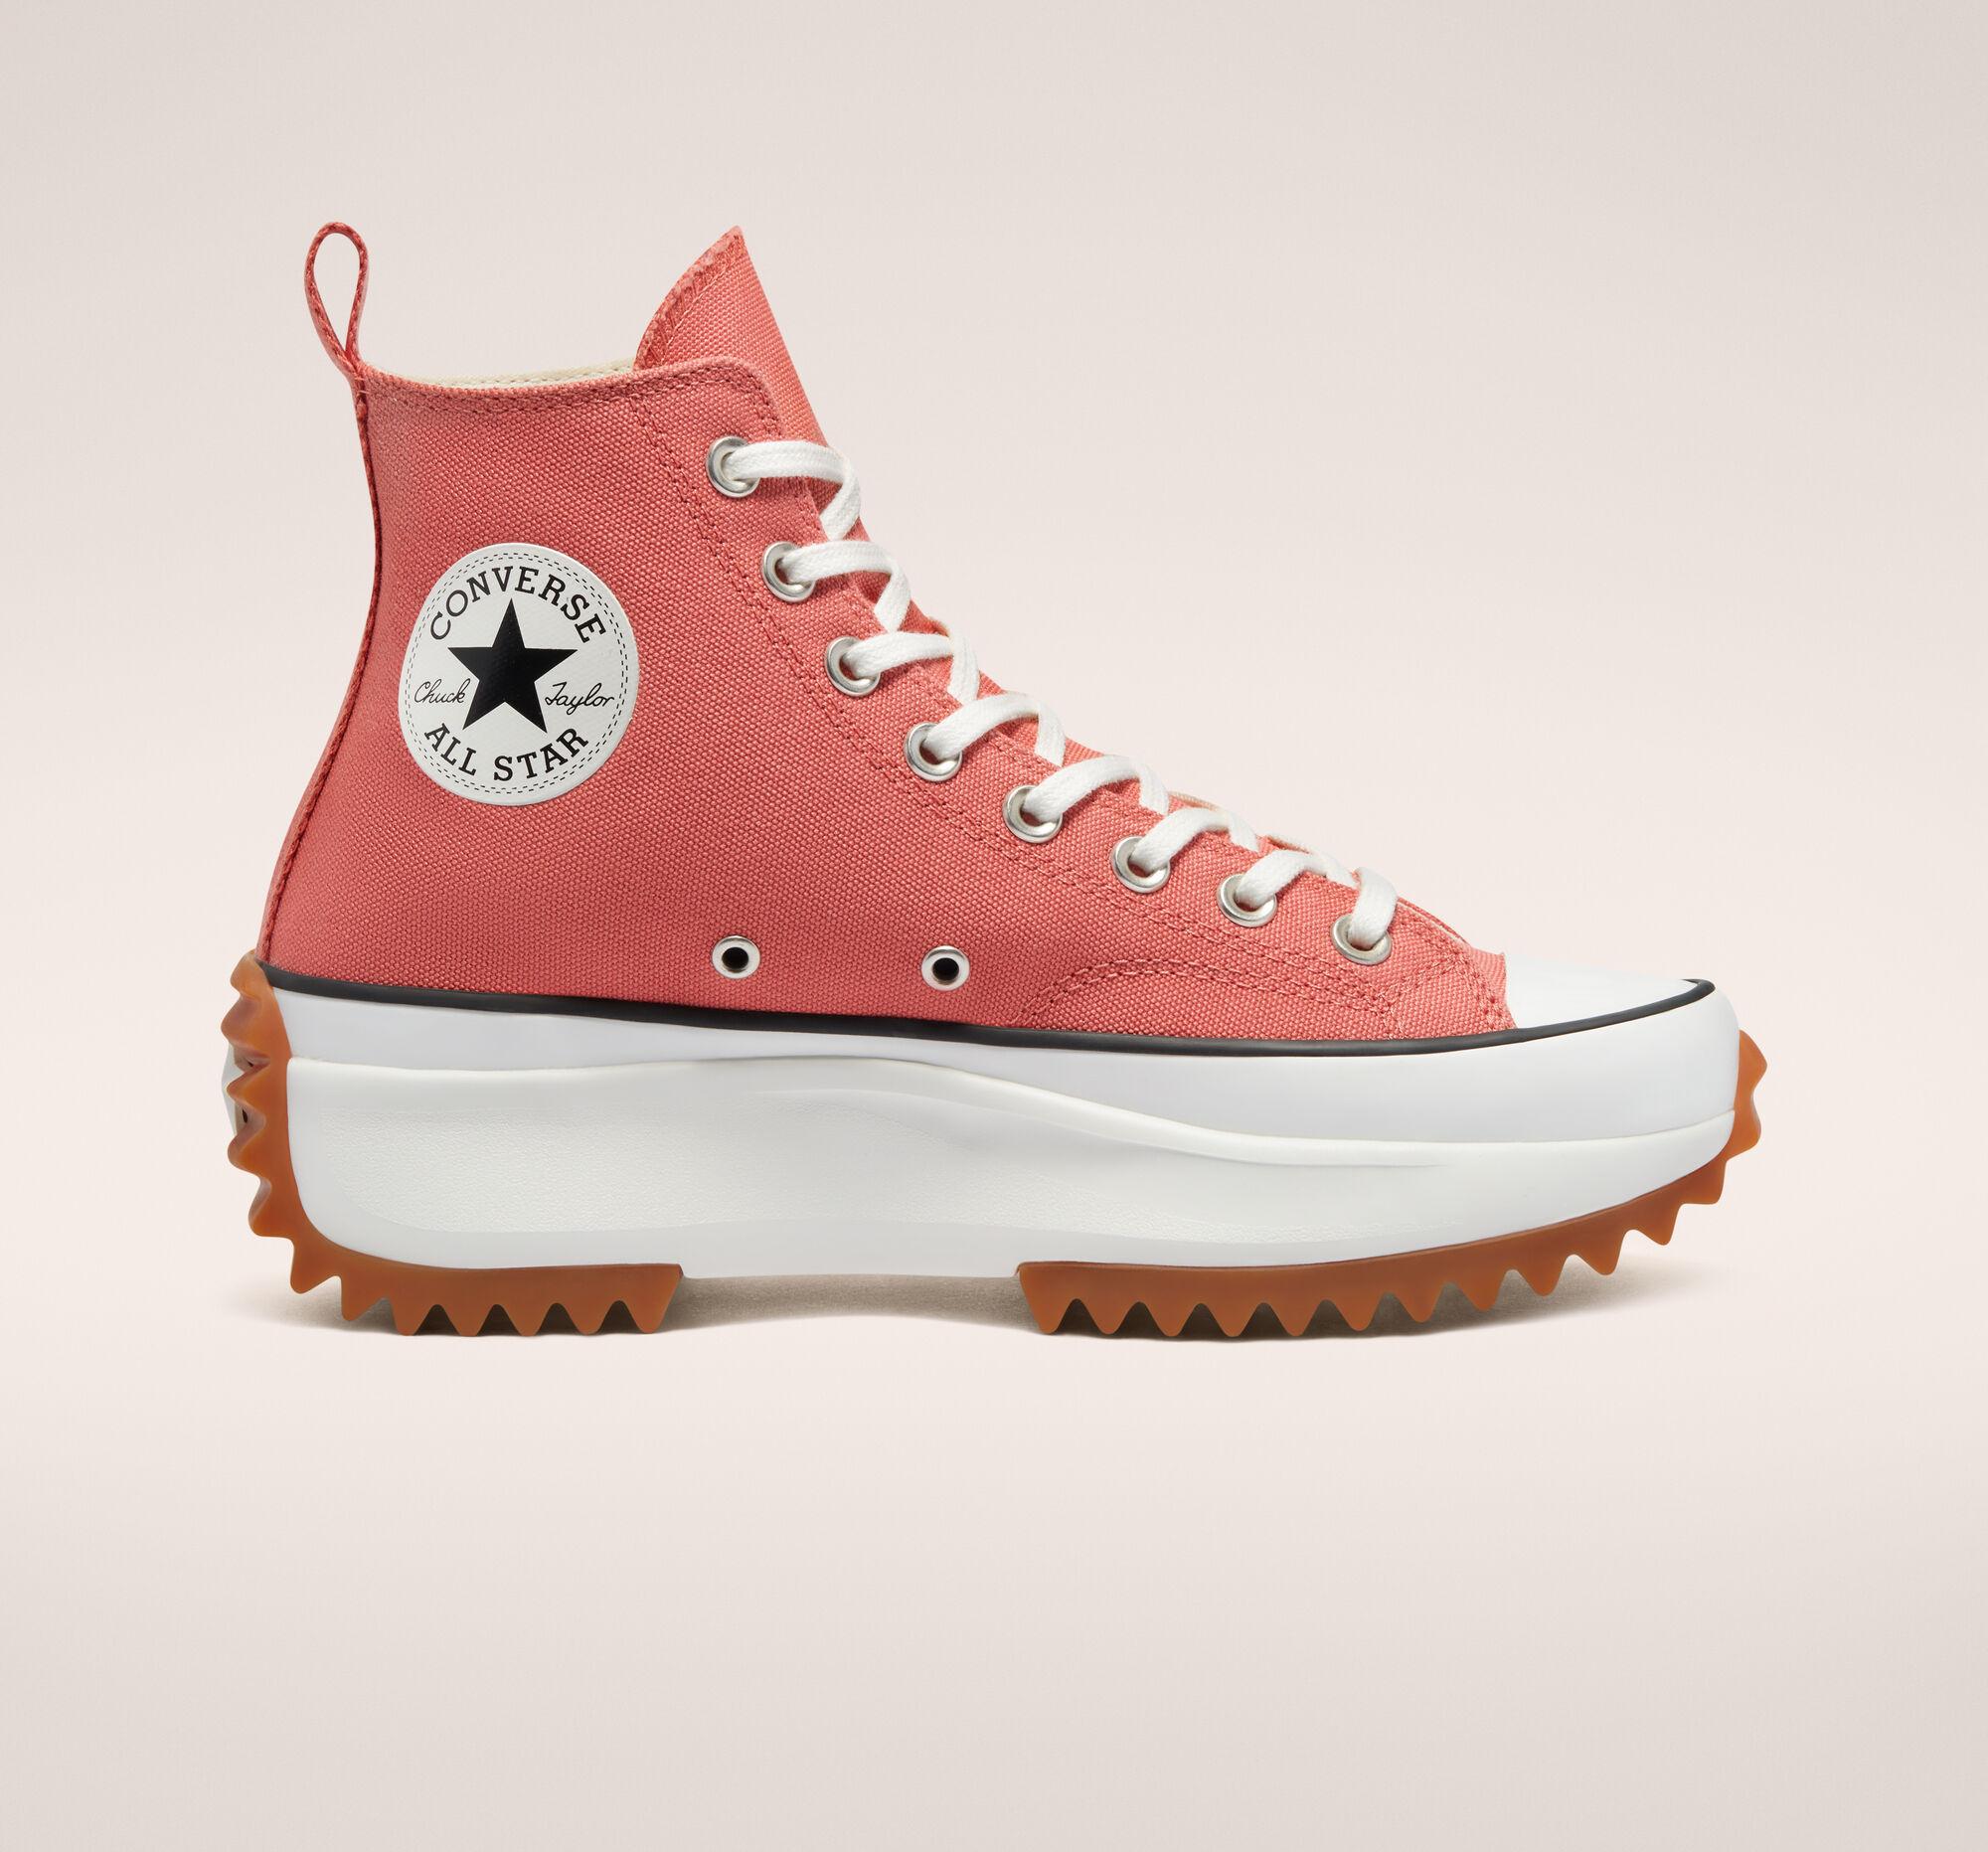 converse-run-star-hike-high-terracotta-pink-171300c0